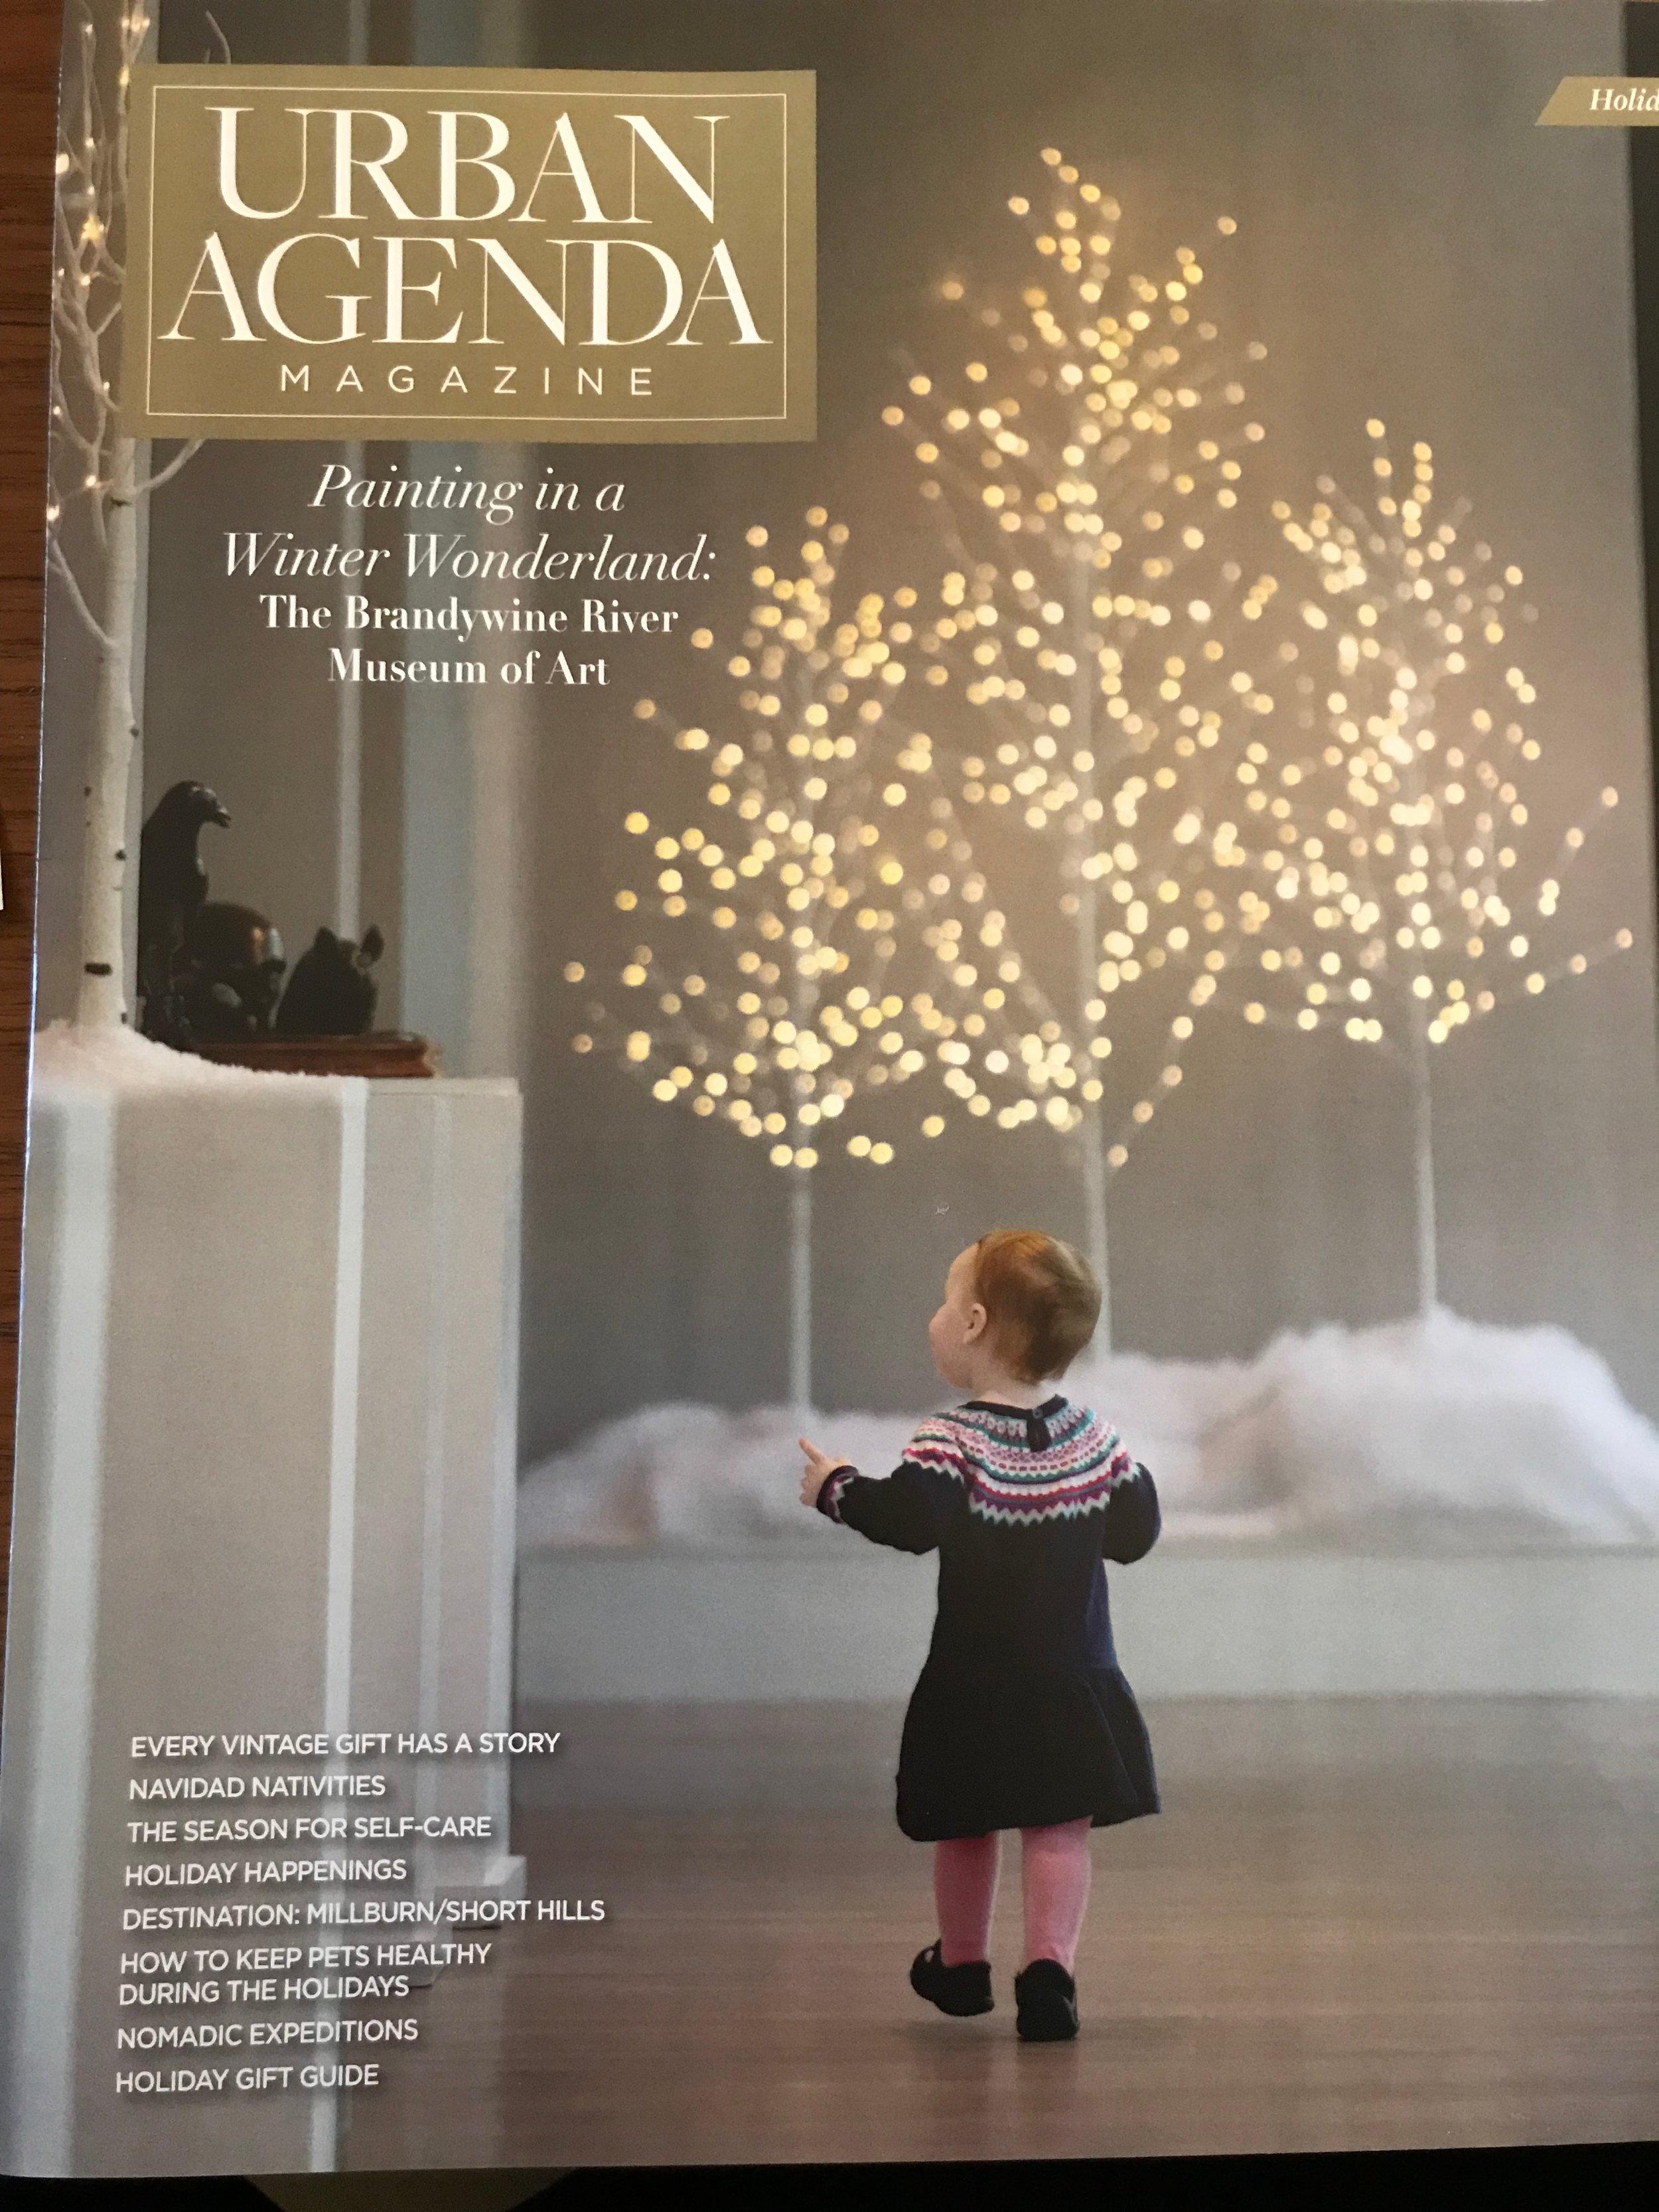 Urban Agenda featured Navidad Nativities